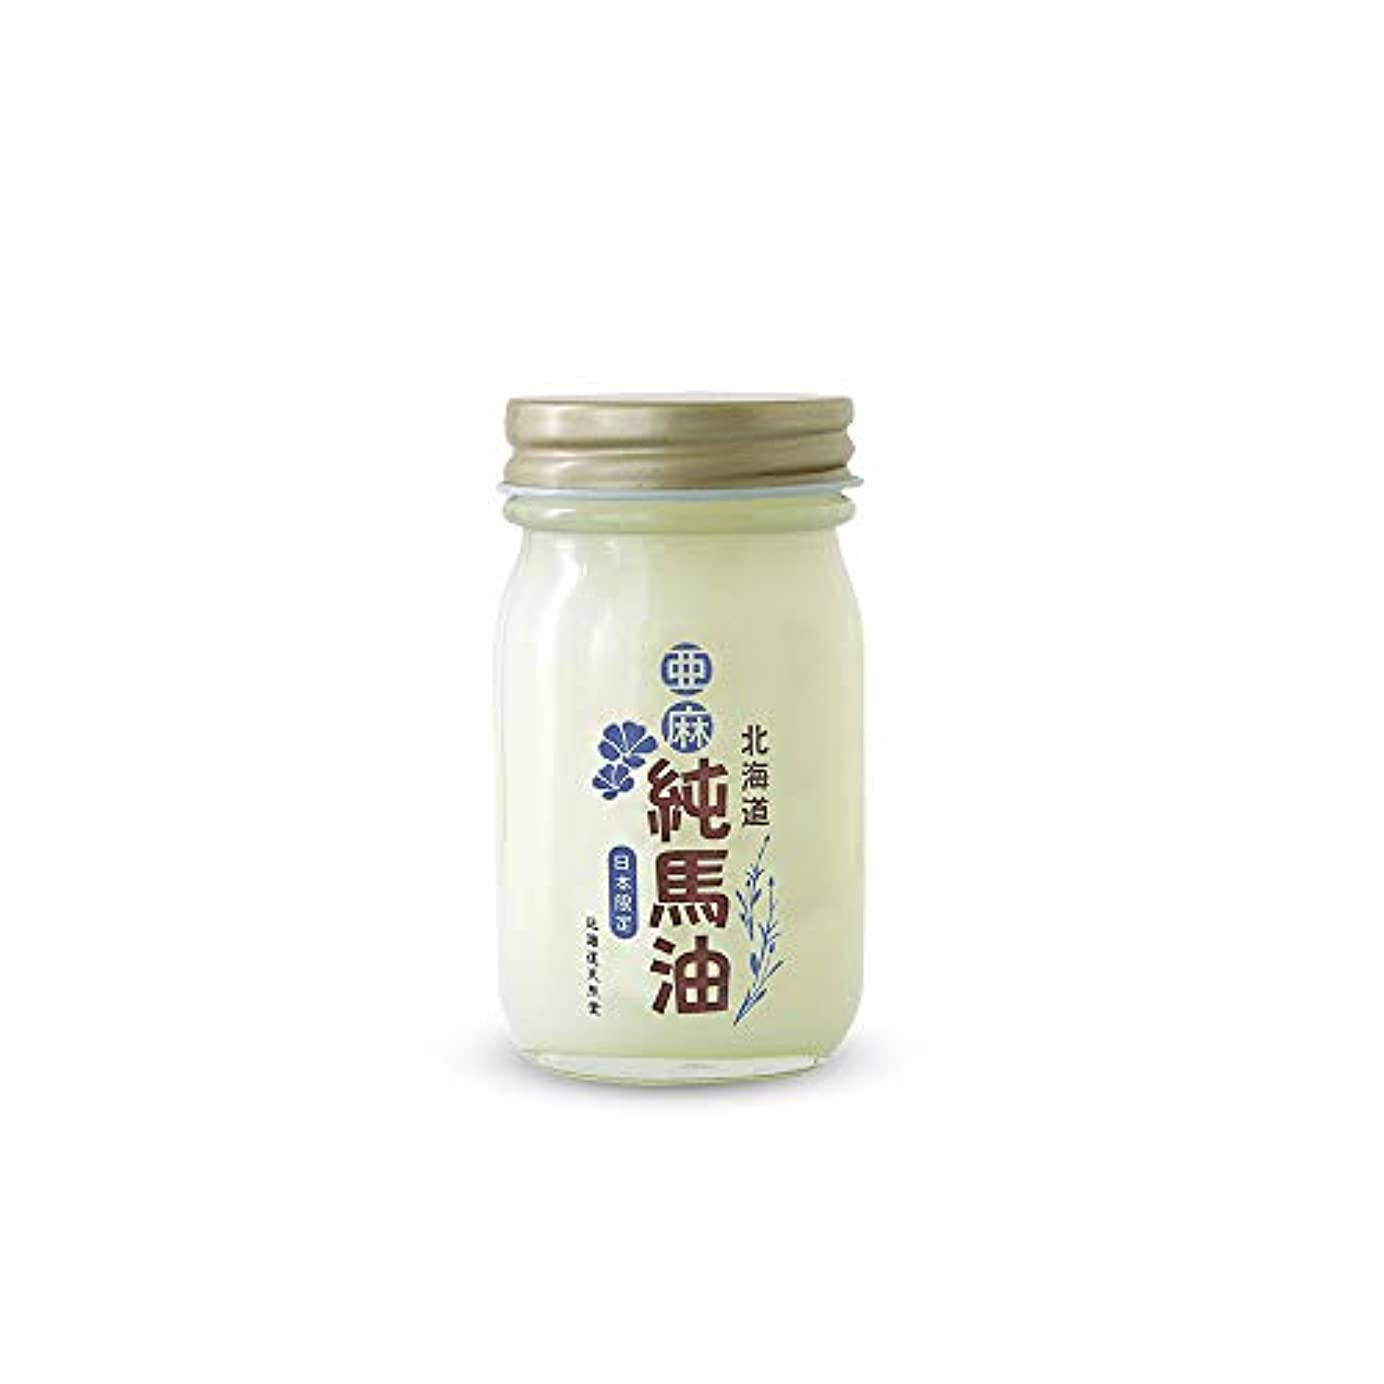 ベール記録交換アマ純馬油 80g / 北海道天然堂